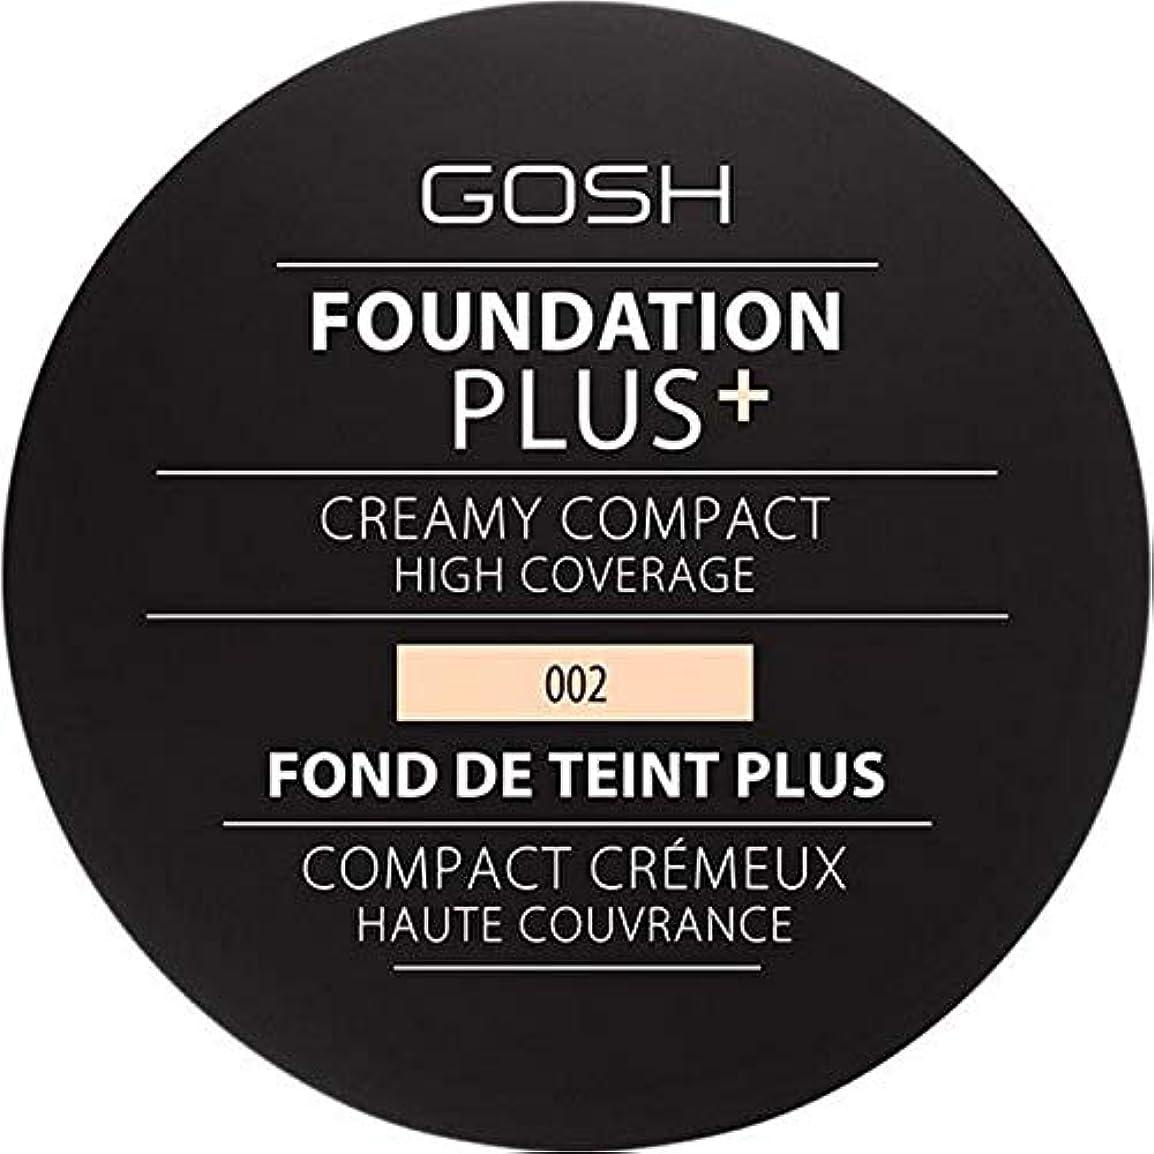 [GOSH ] 基礎プラス+クリーミーコンパクトアイボリー002 - Foundation Plus+ Creamy Compact Ivory 002 [並行輸入品]